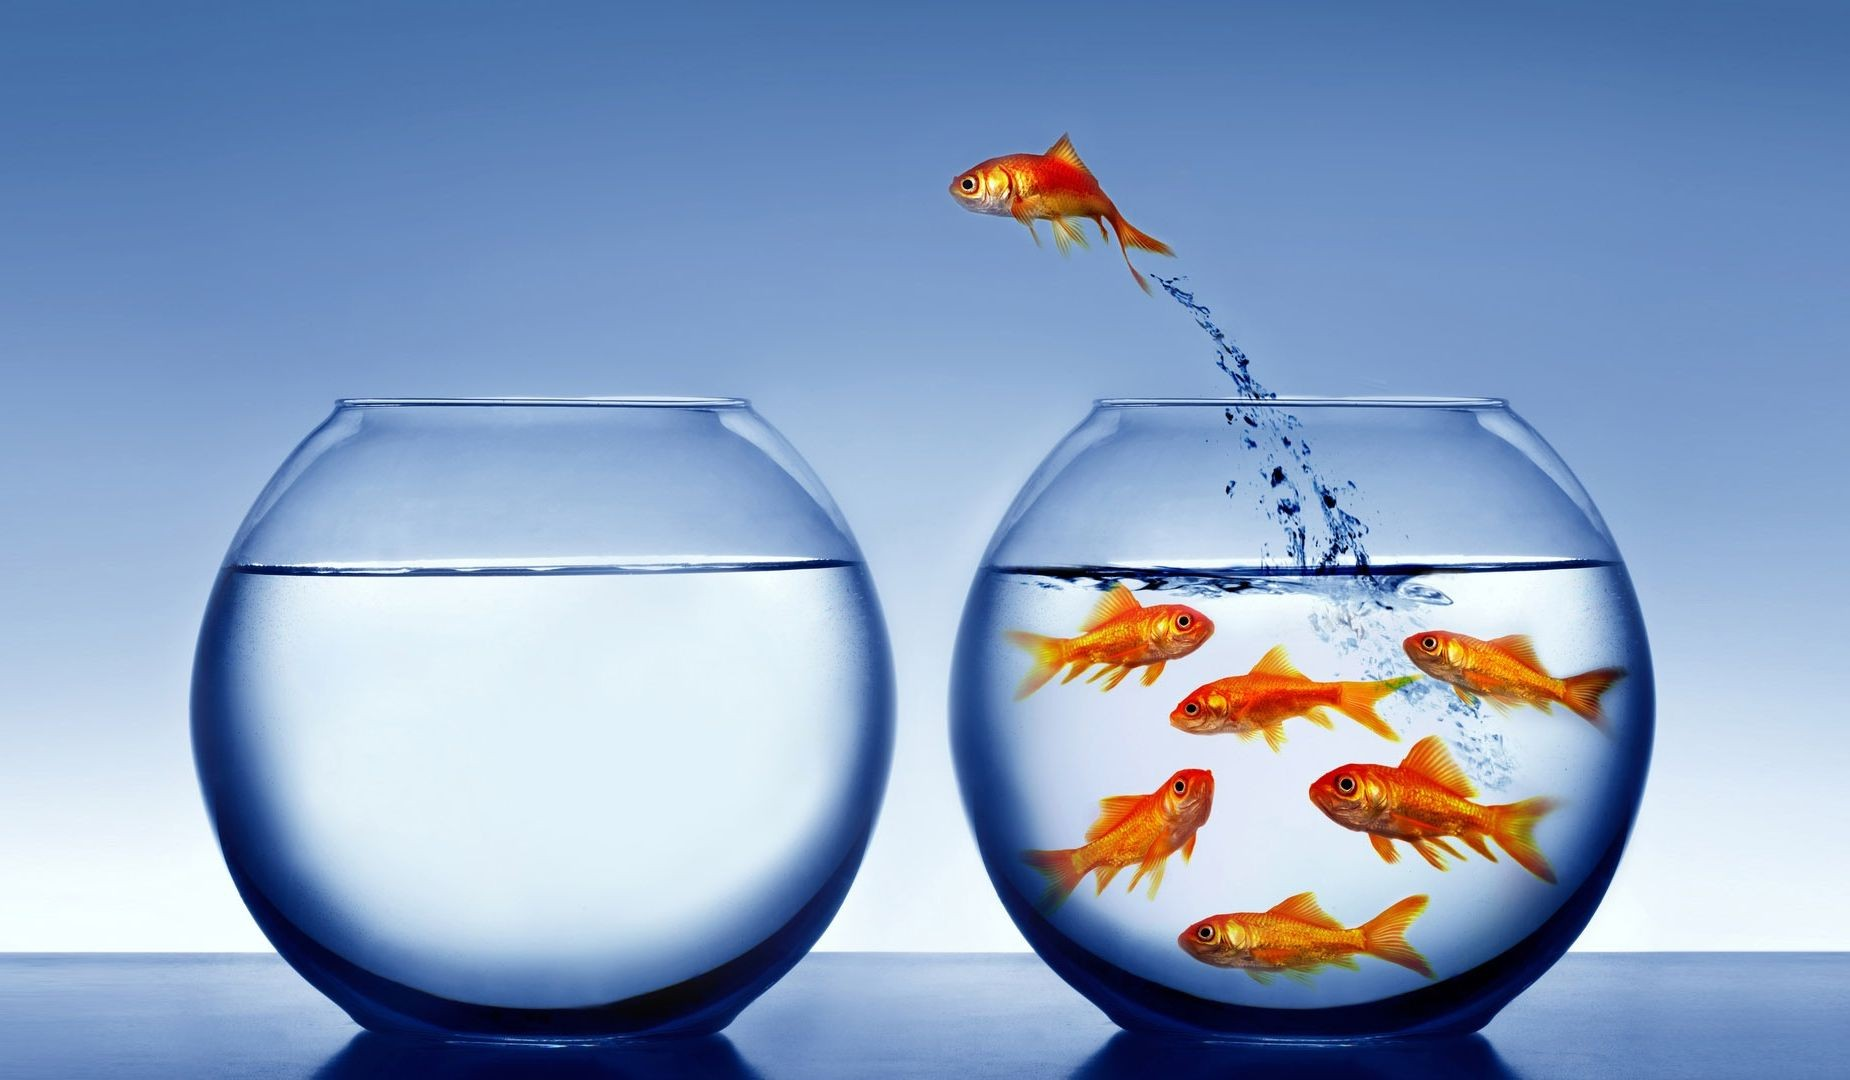 fish-trick-goldfish-bowl-jump-fish-jumping-desktop-background-images